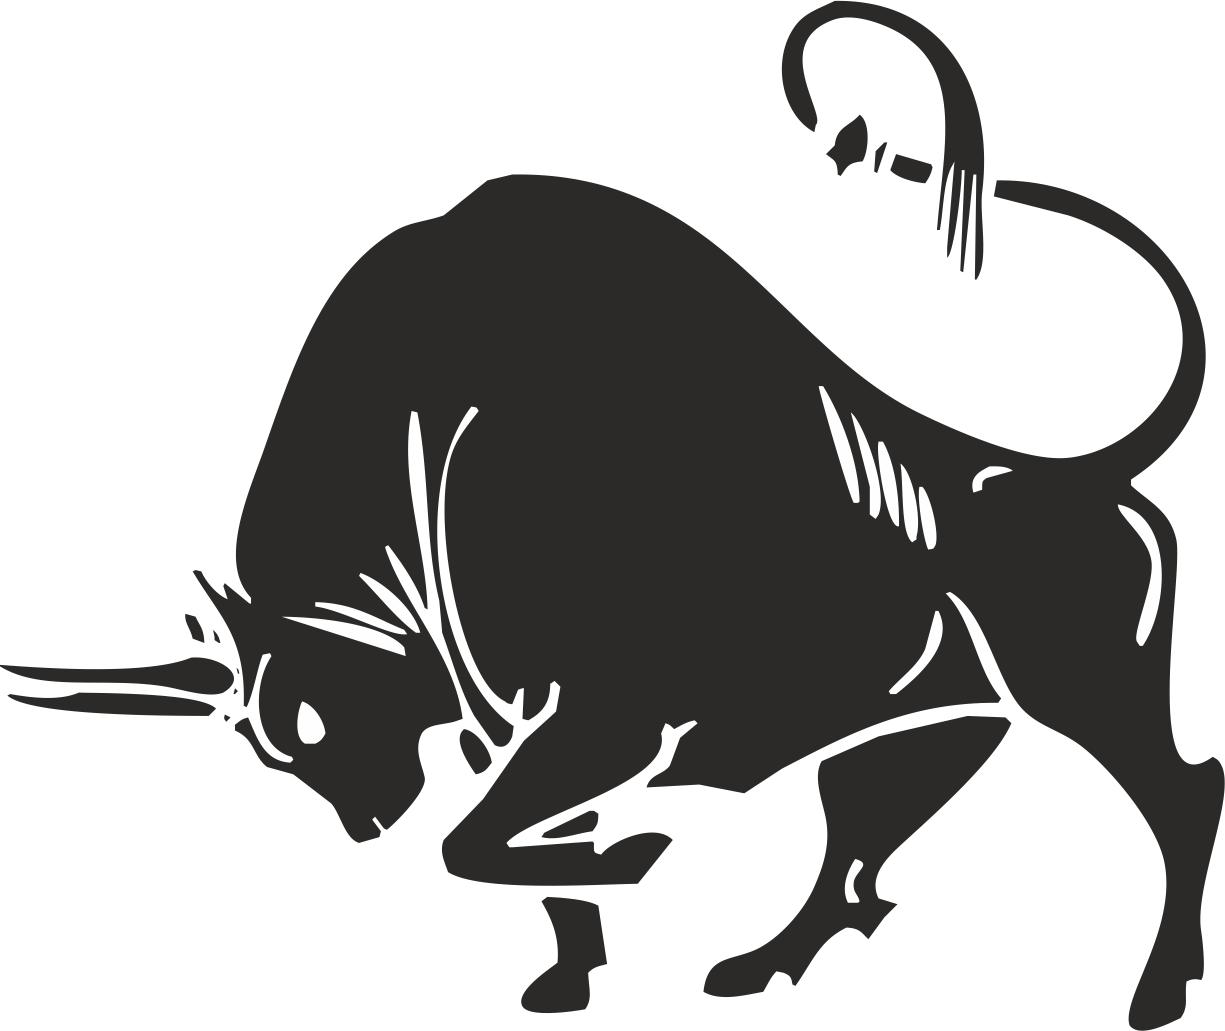 Bull Silhouette File Free CDR Vectors Art